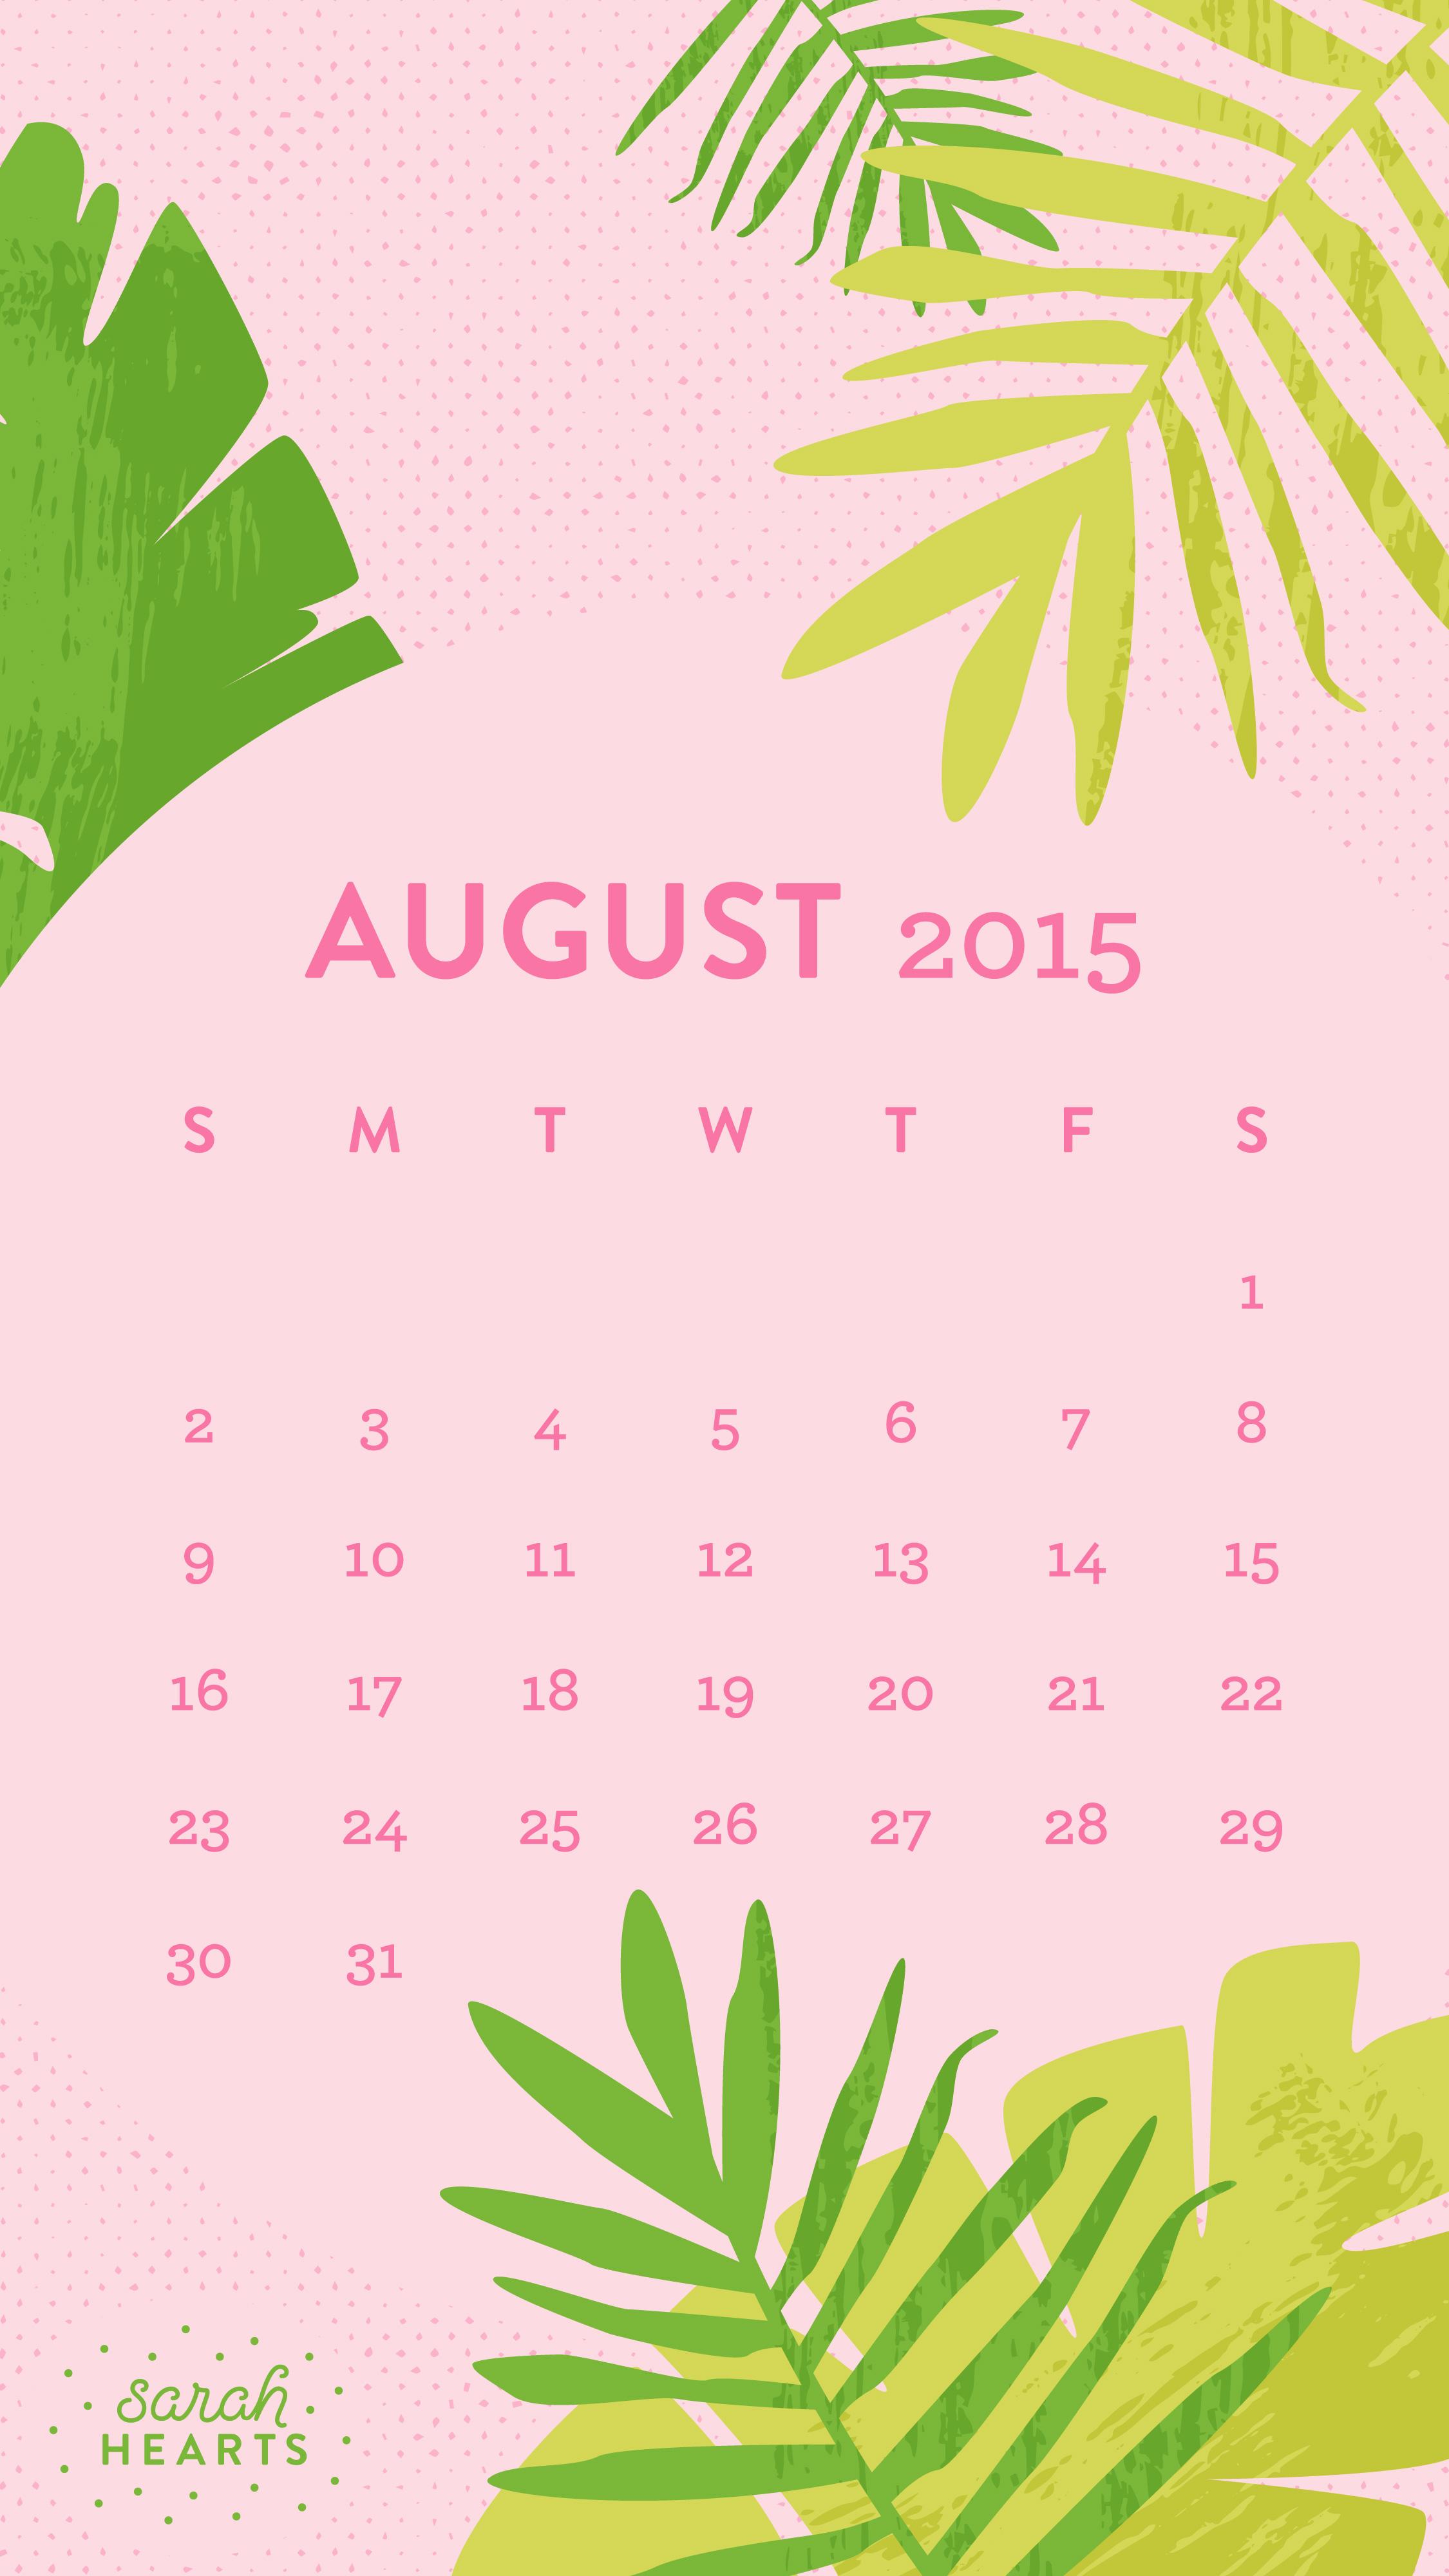 Emoji Wallpaper Quotes August 2015 Calendar Wallpaper Sarah Hearts